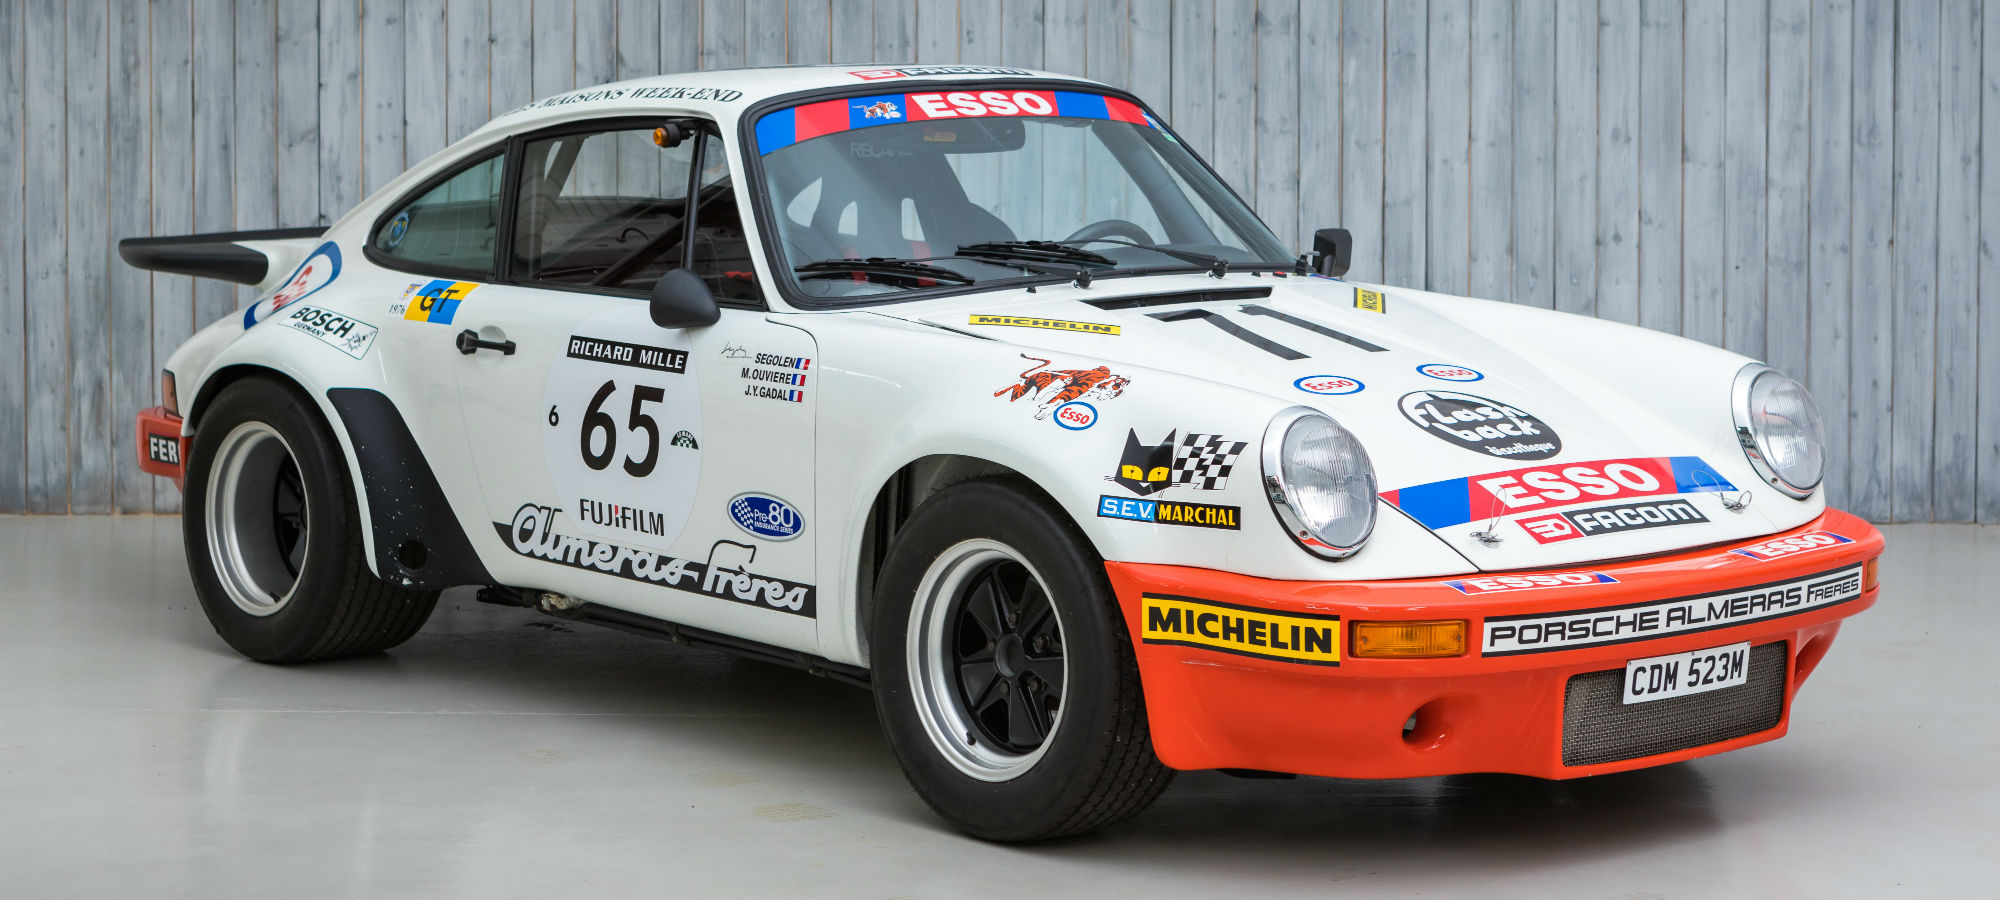 The Le Mans 24 Hours Class Winning 1974 Porsche 911 Carrera 3.0 RS